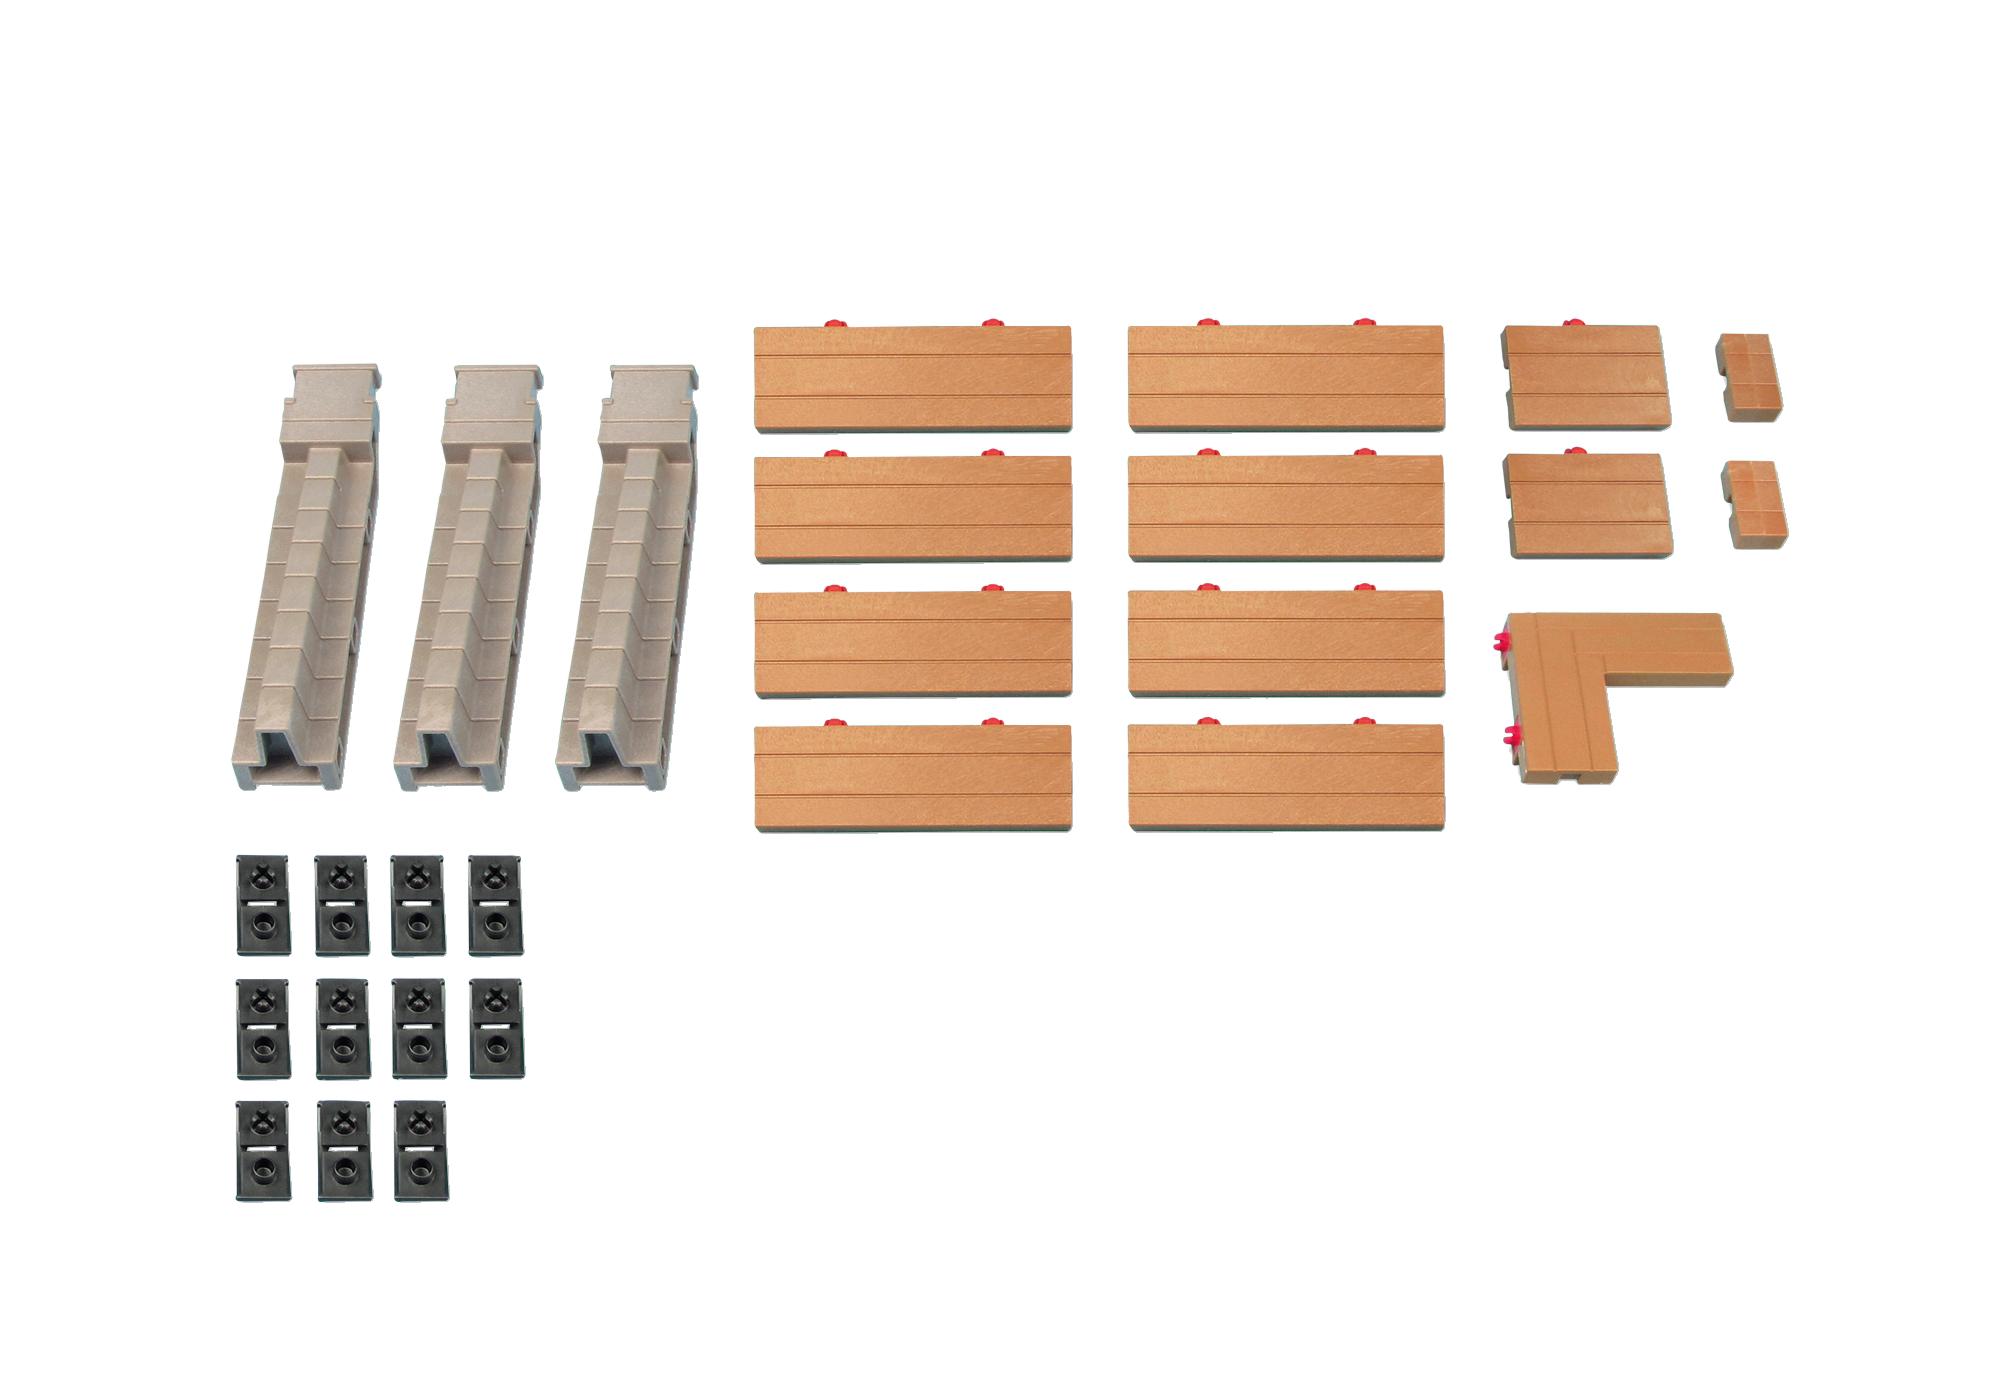 http://media.playmobil.com/i/playmobil/6372_product_detail/Pared de Conexión para el Castillo de los Caballeros Reales del